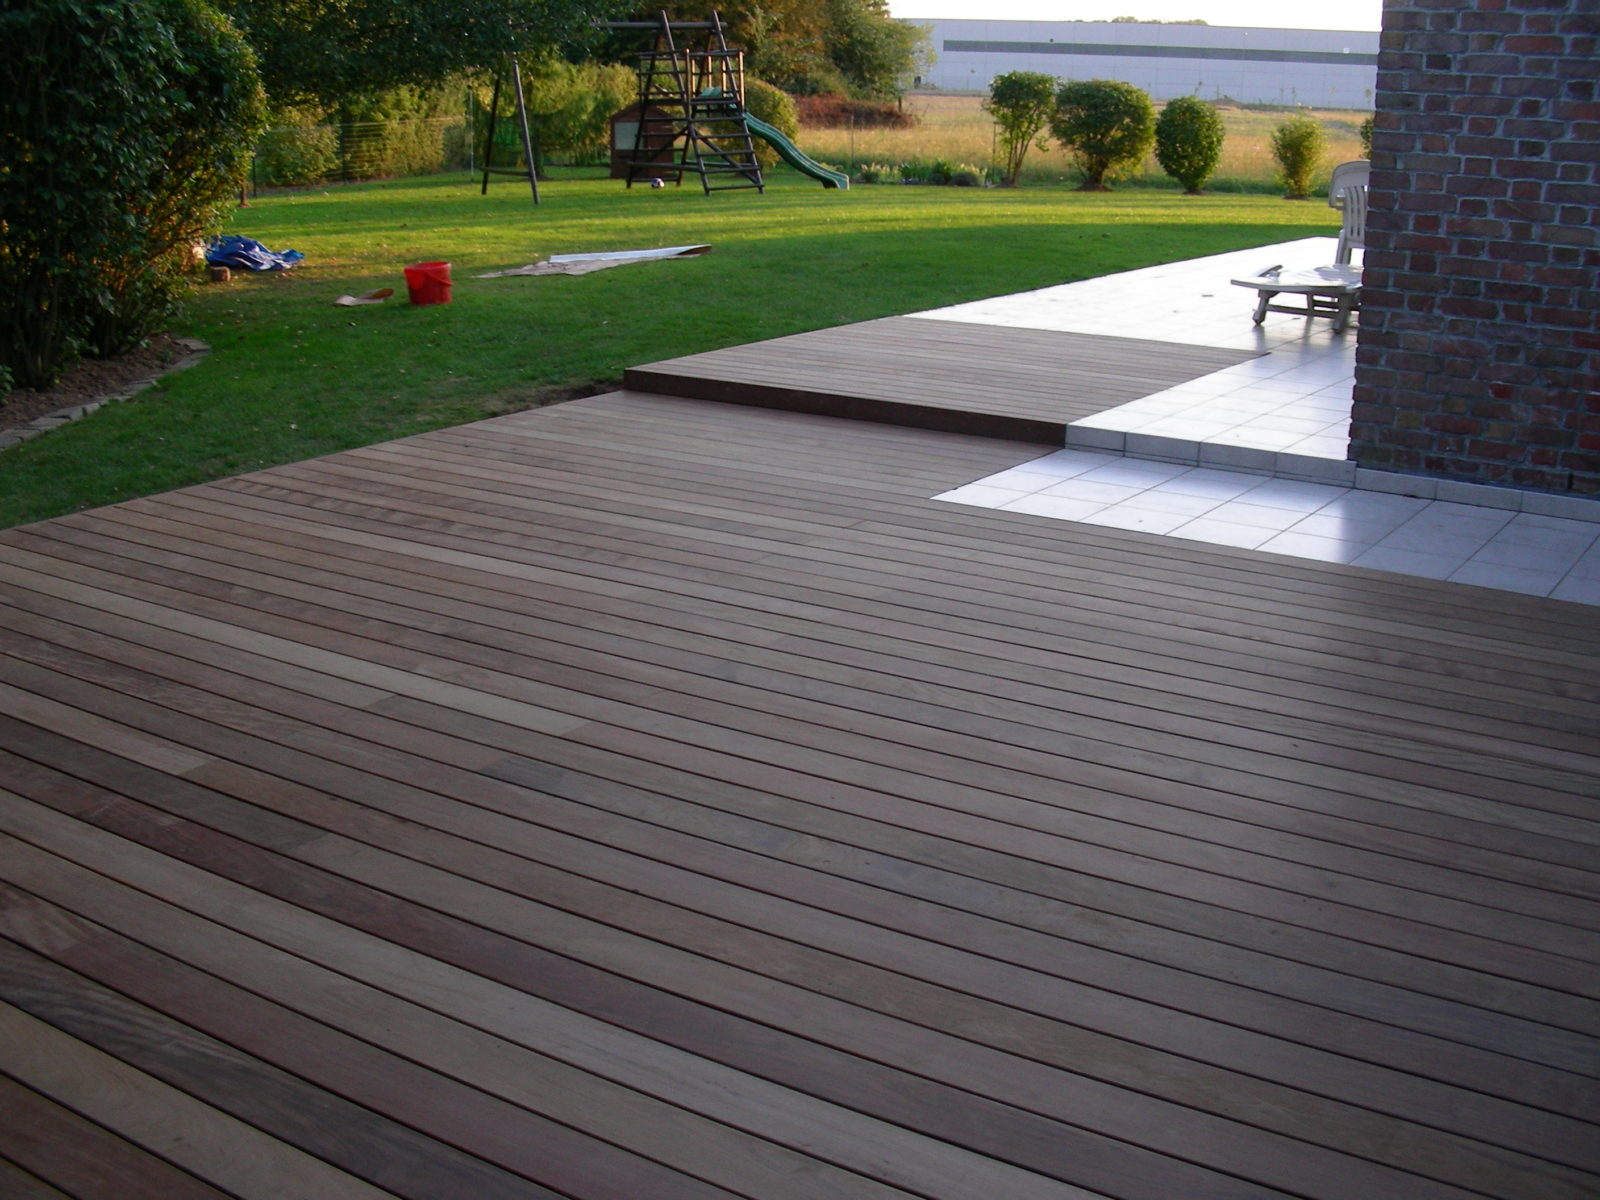 Terrasse en bois exotique IPE Destombes Bois